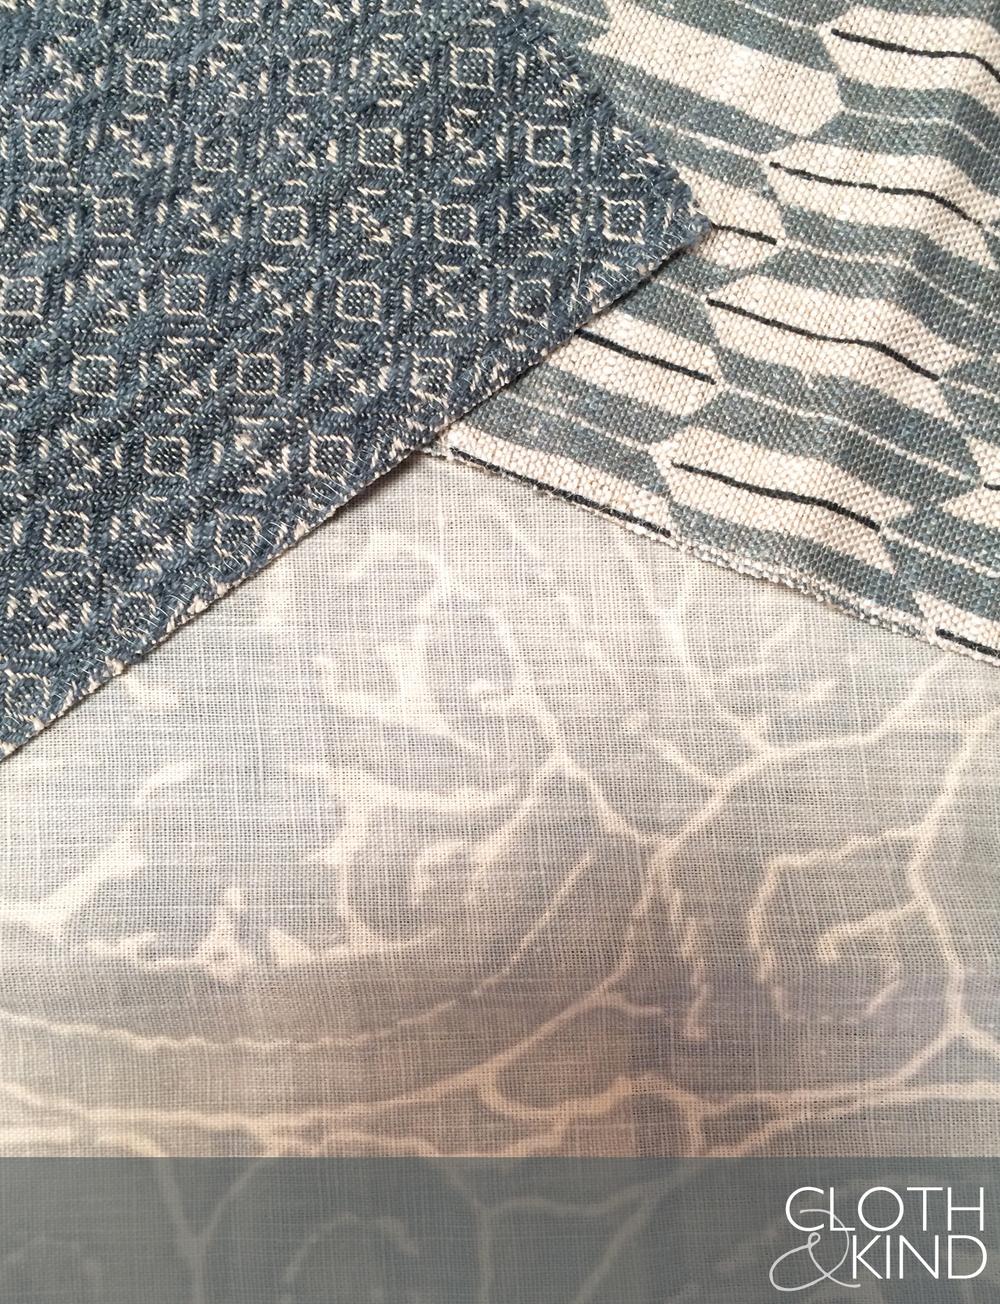 CLOTH & KIND // Palette No. 50